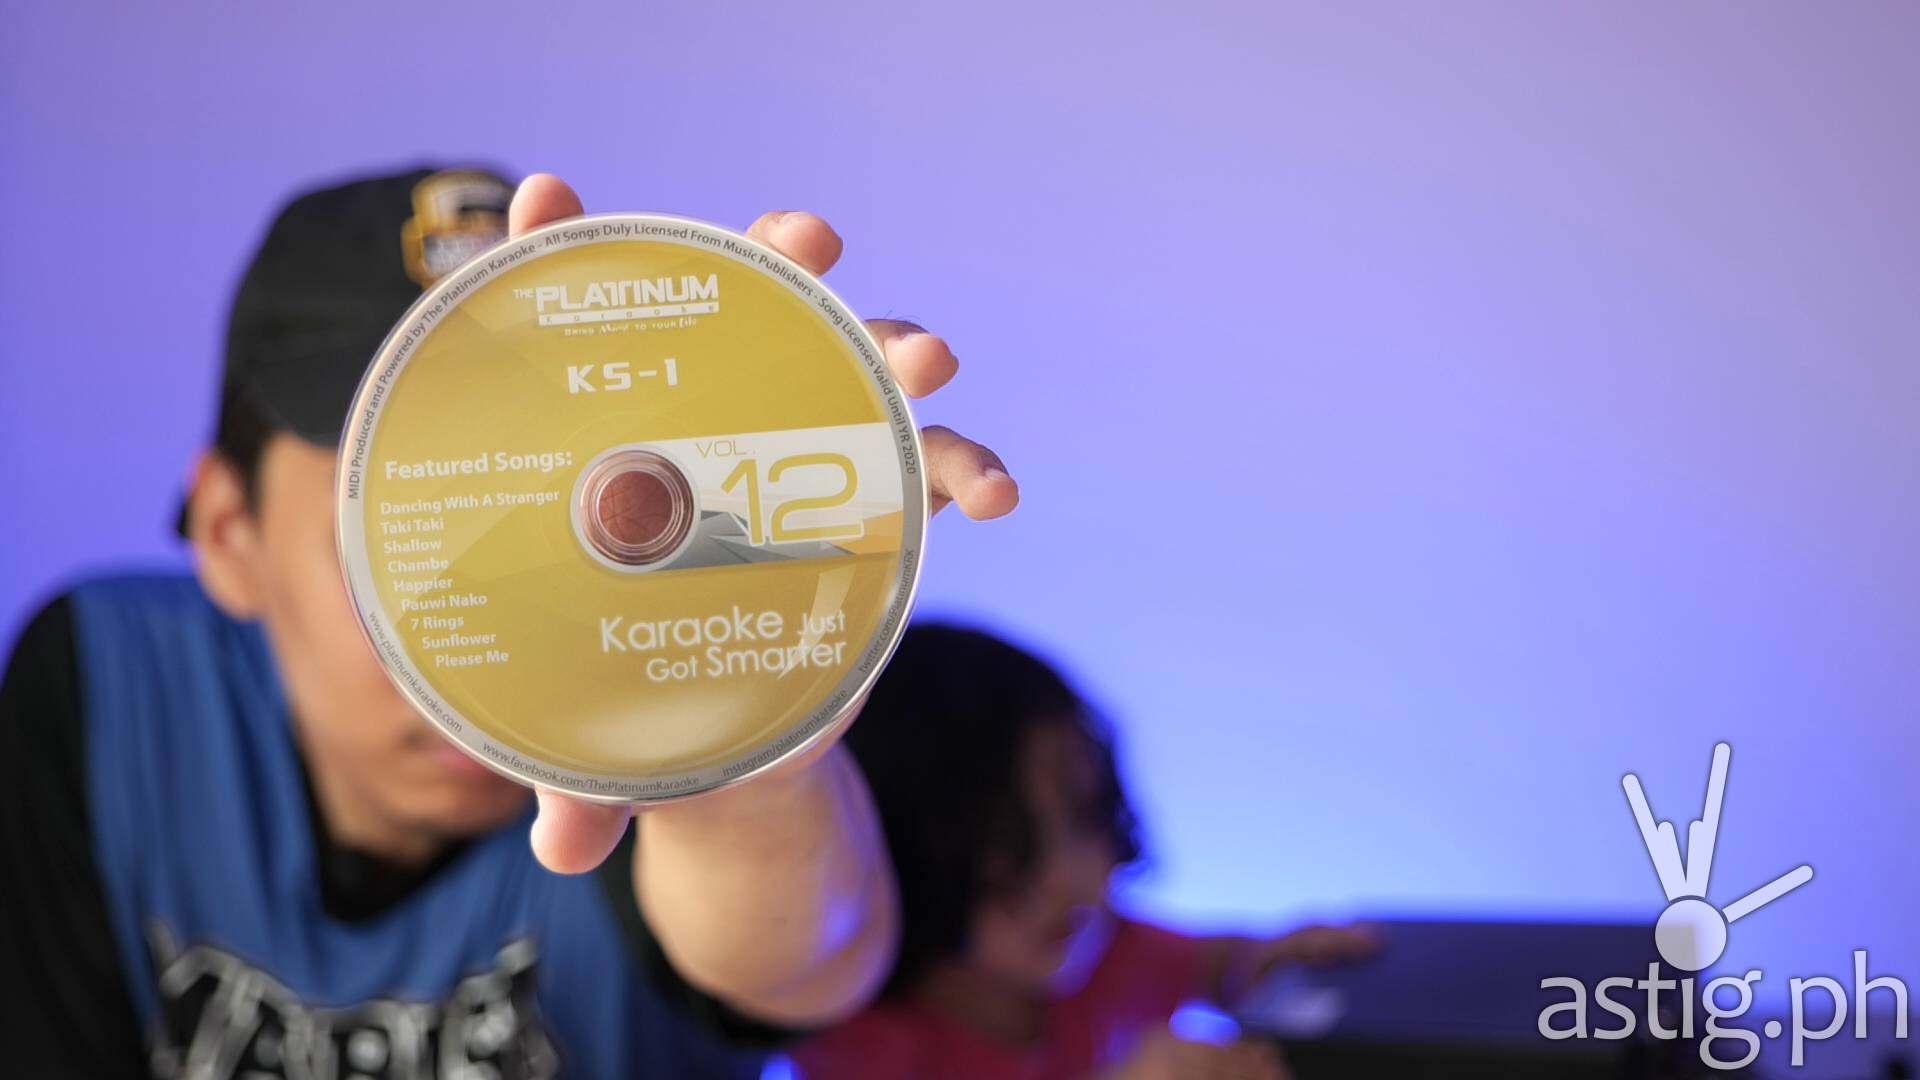 Song expansion disc - Platinum Karaoke KS-1 home karaoke videoke system